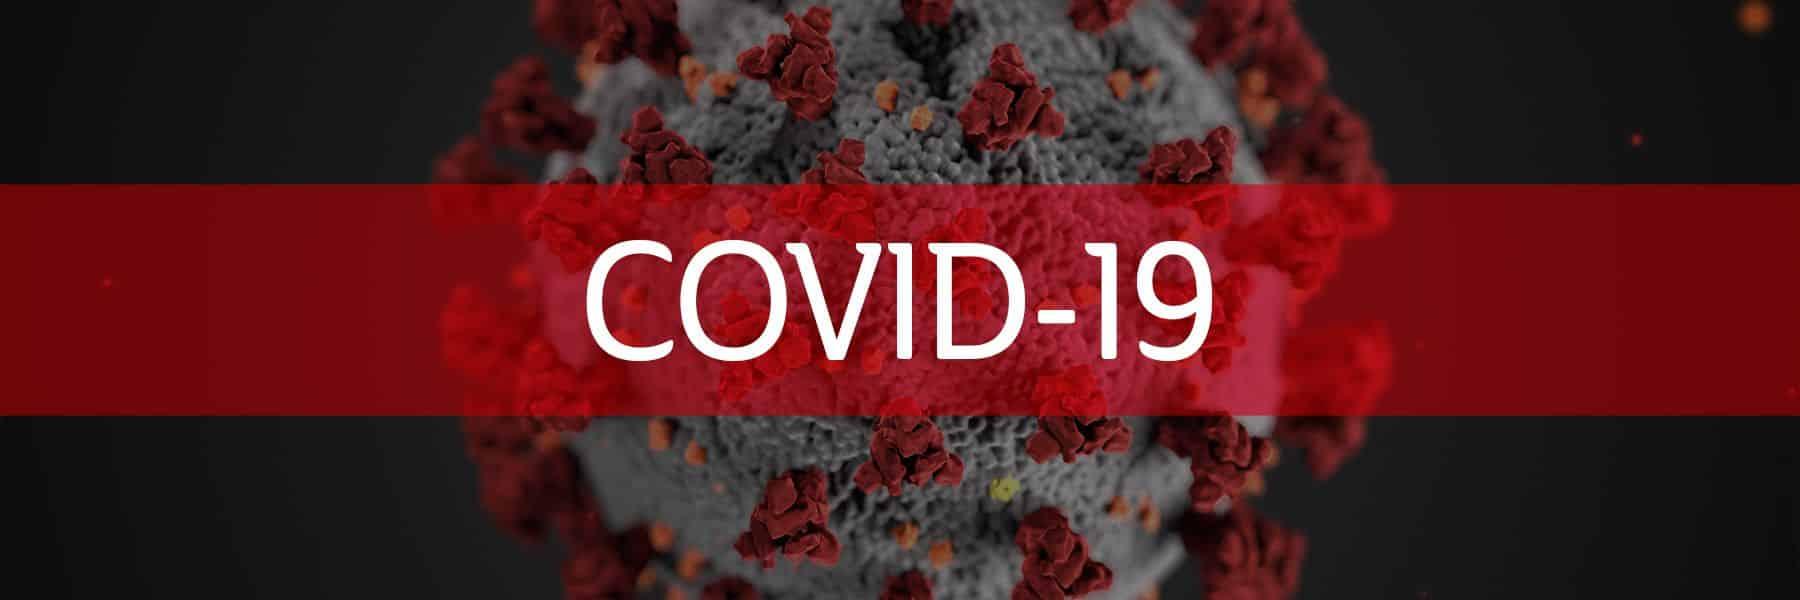 COVID19 traitement